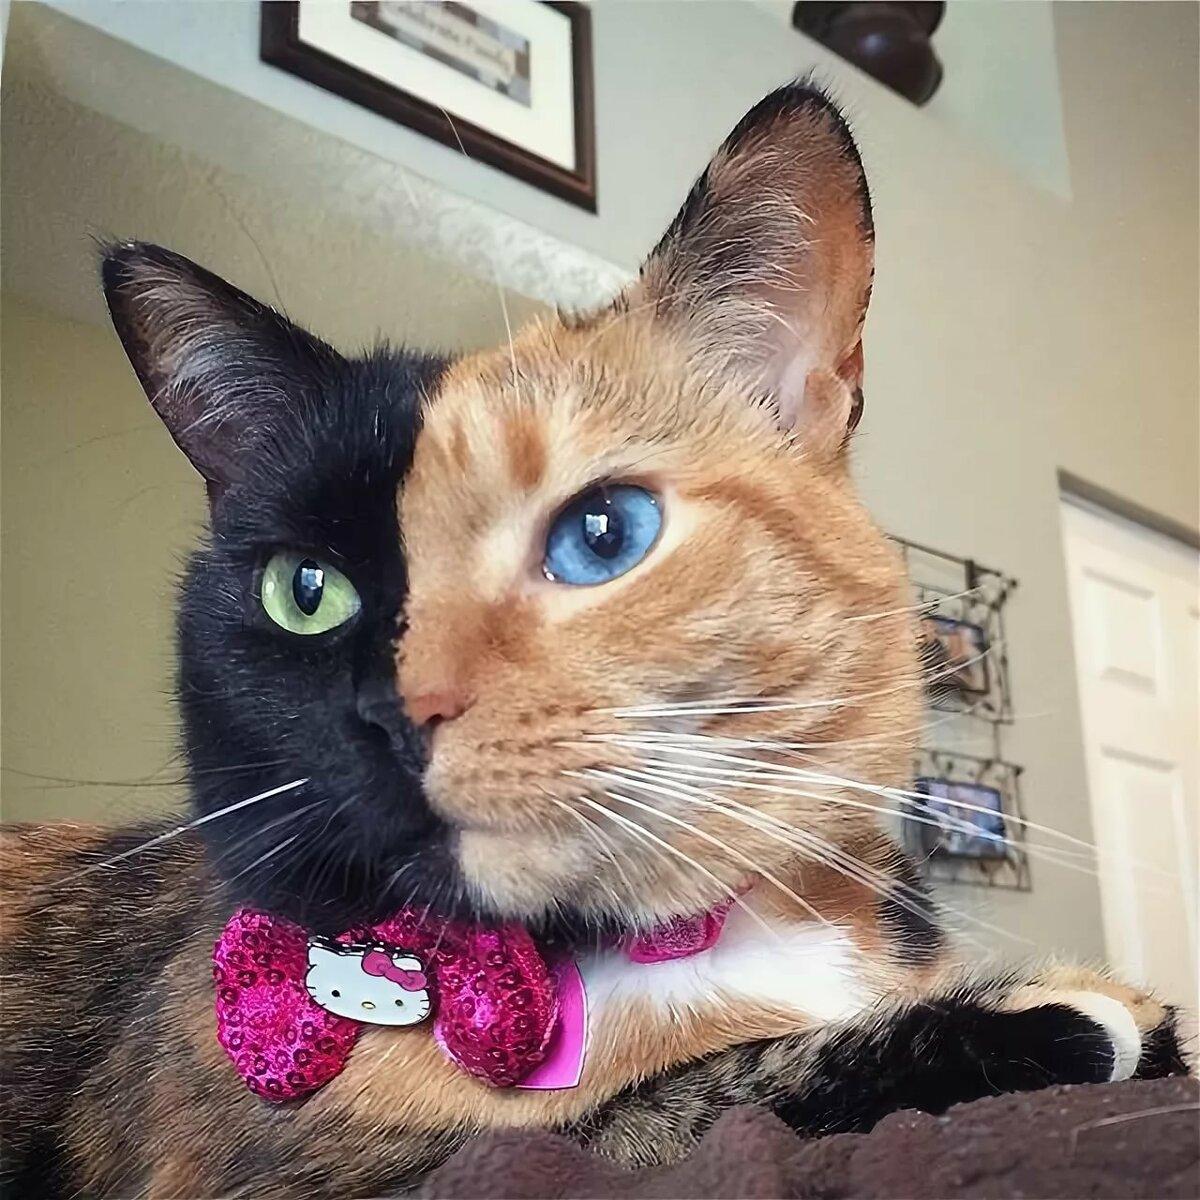 пвх лодки картинки необычного кота для